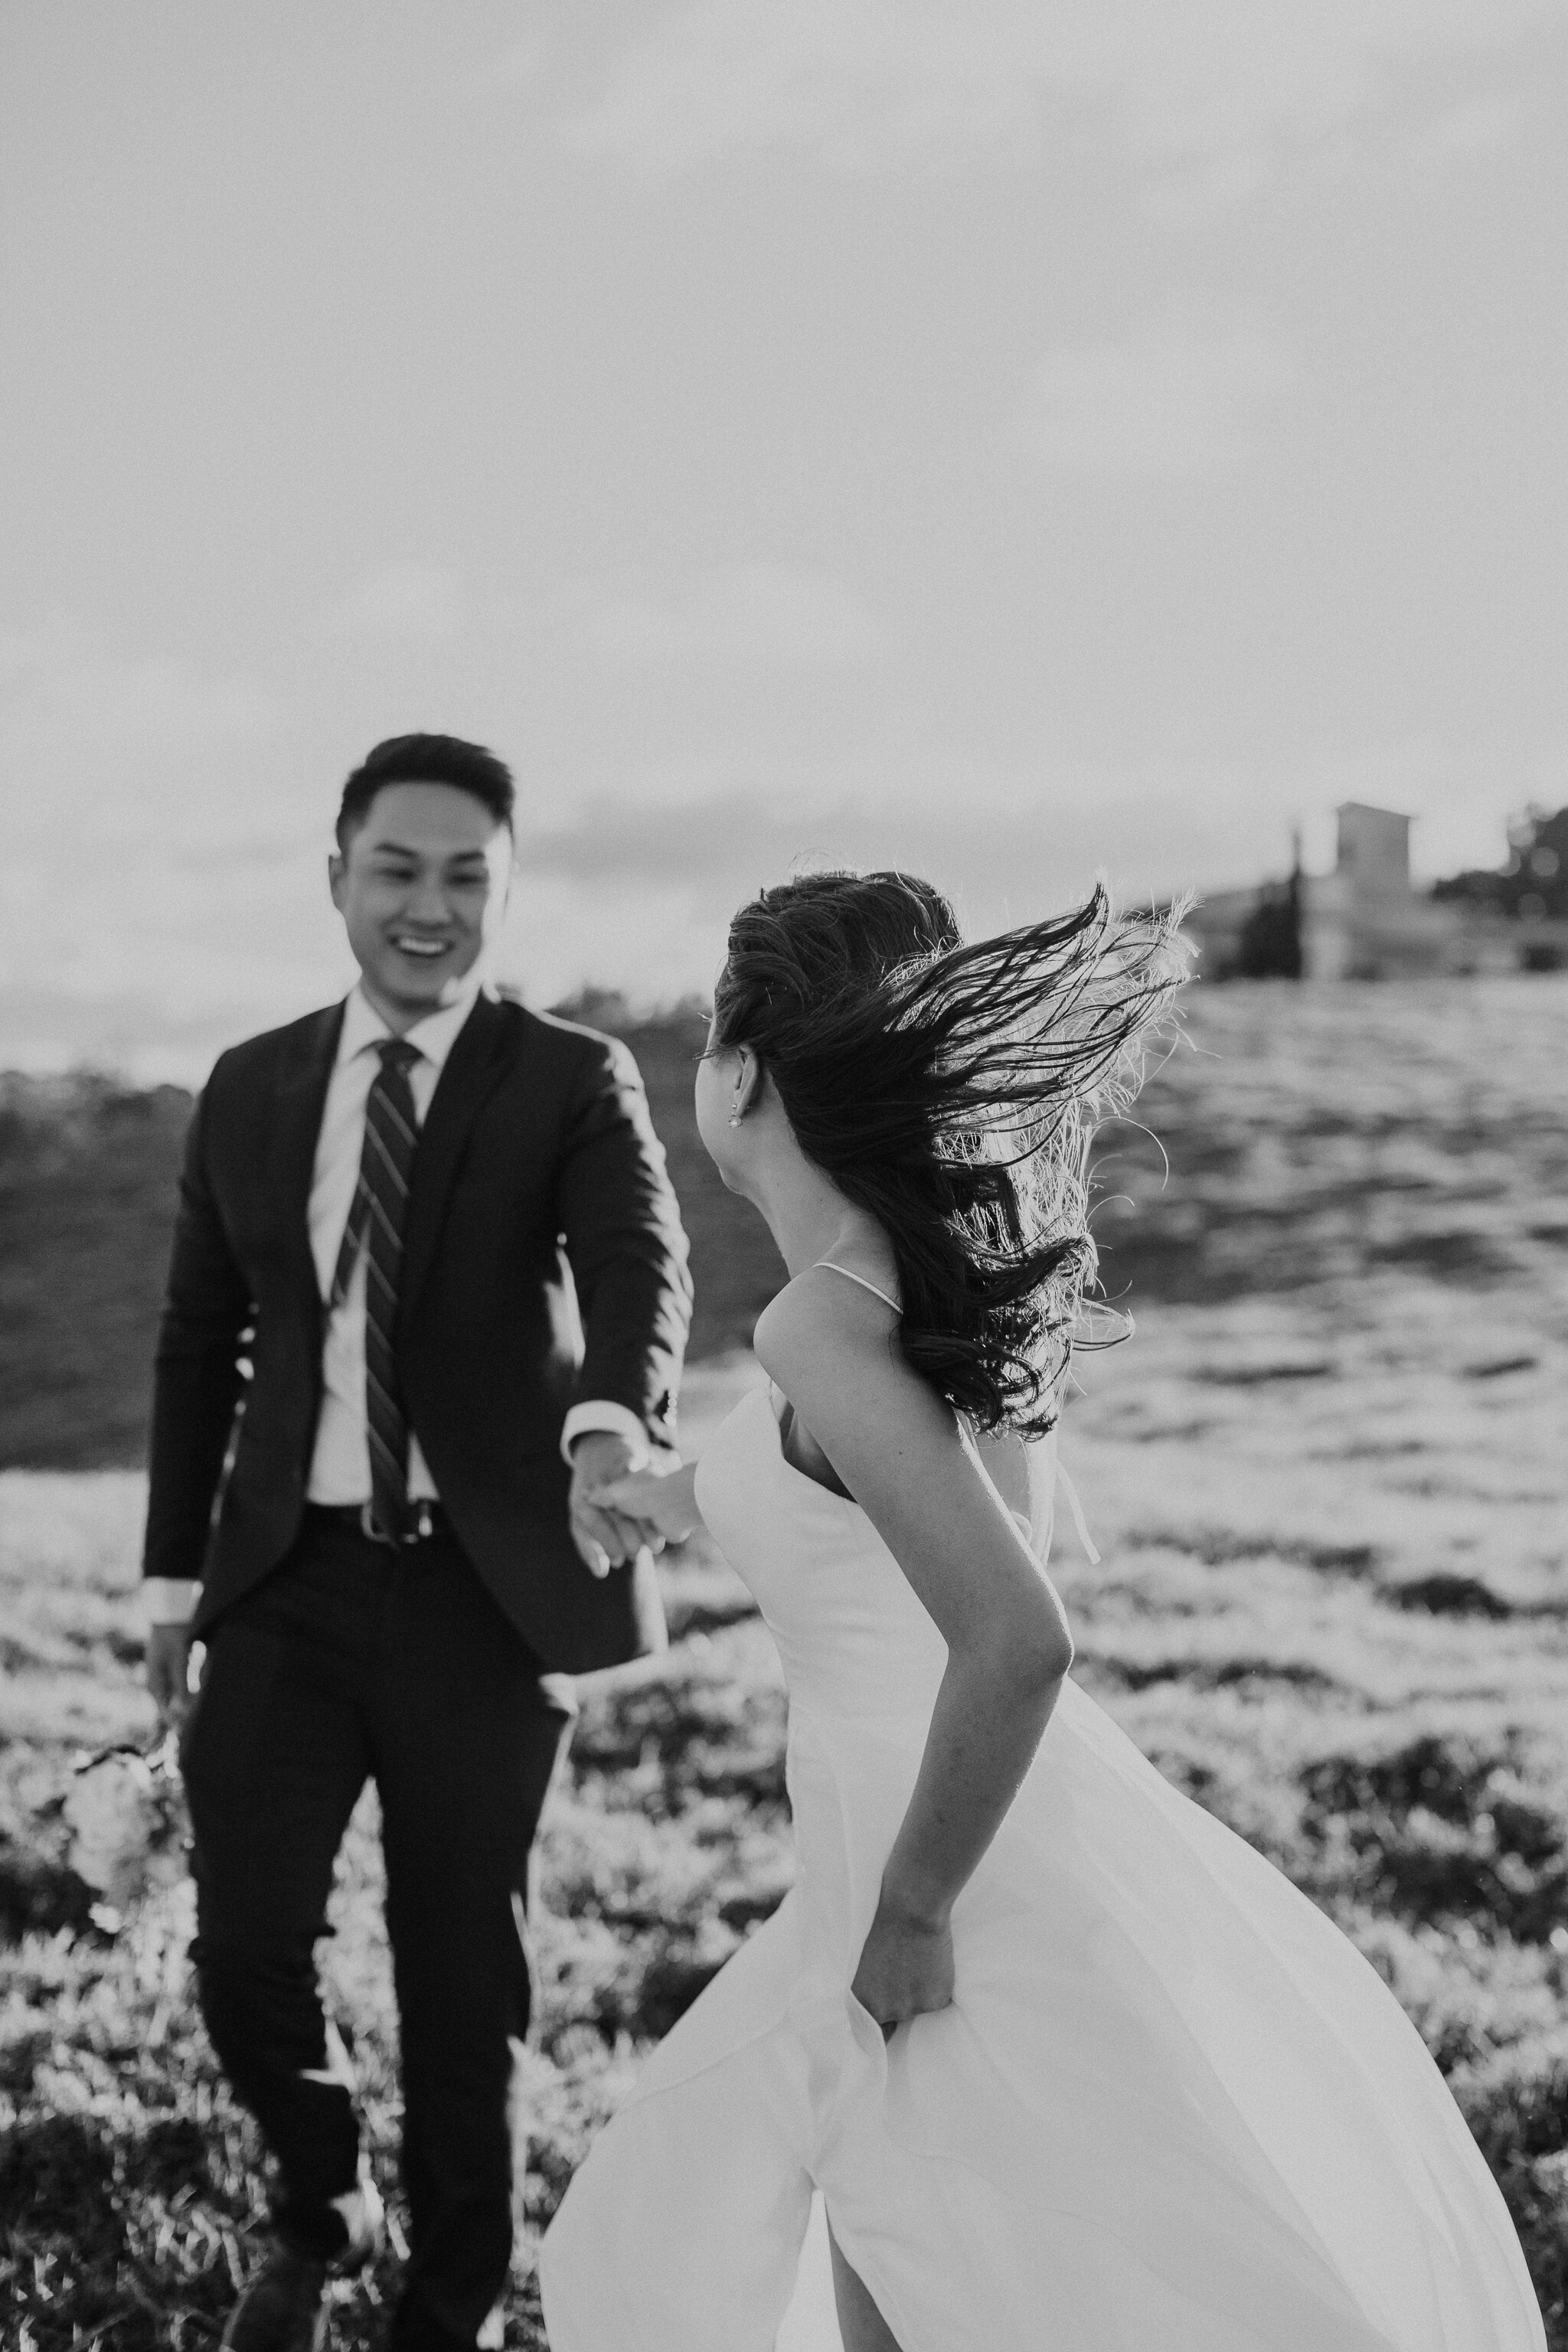 Maleny One Tree Hill Wedding - Maleny Wedding Photographer-2.jpg